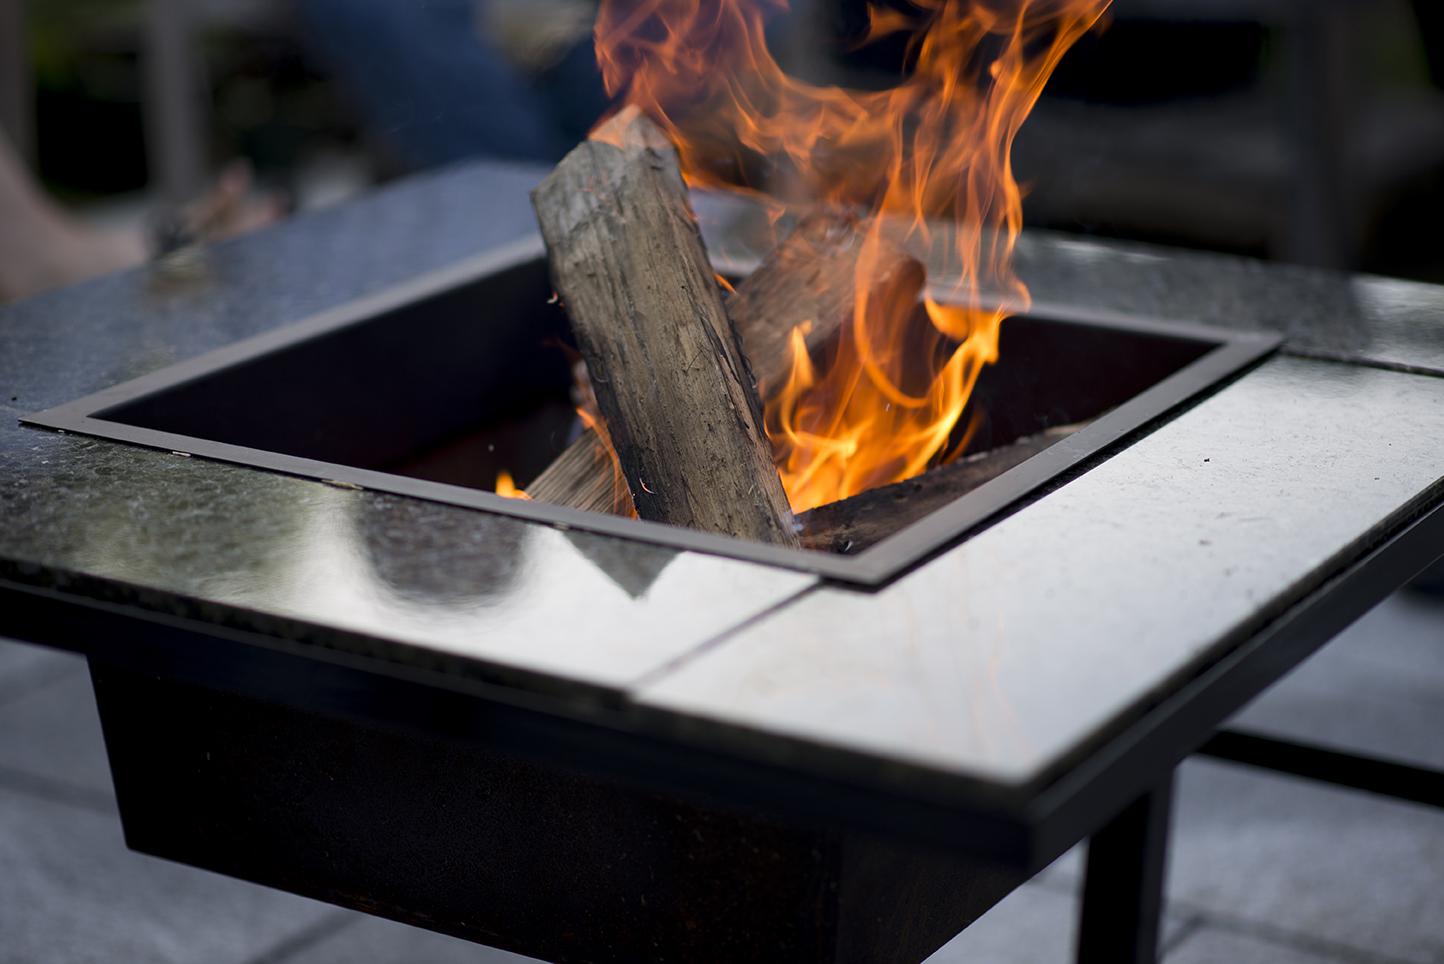 The Original Wood Burning KSV 4IN (2014)